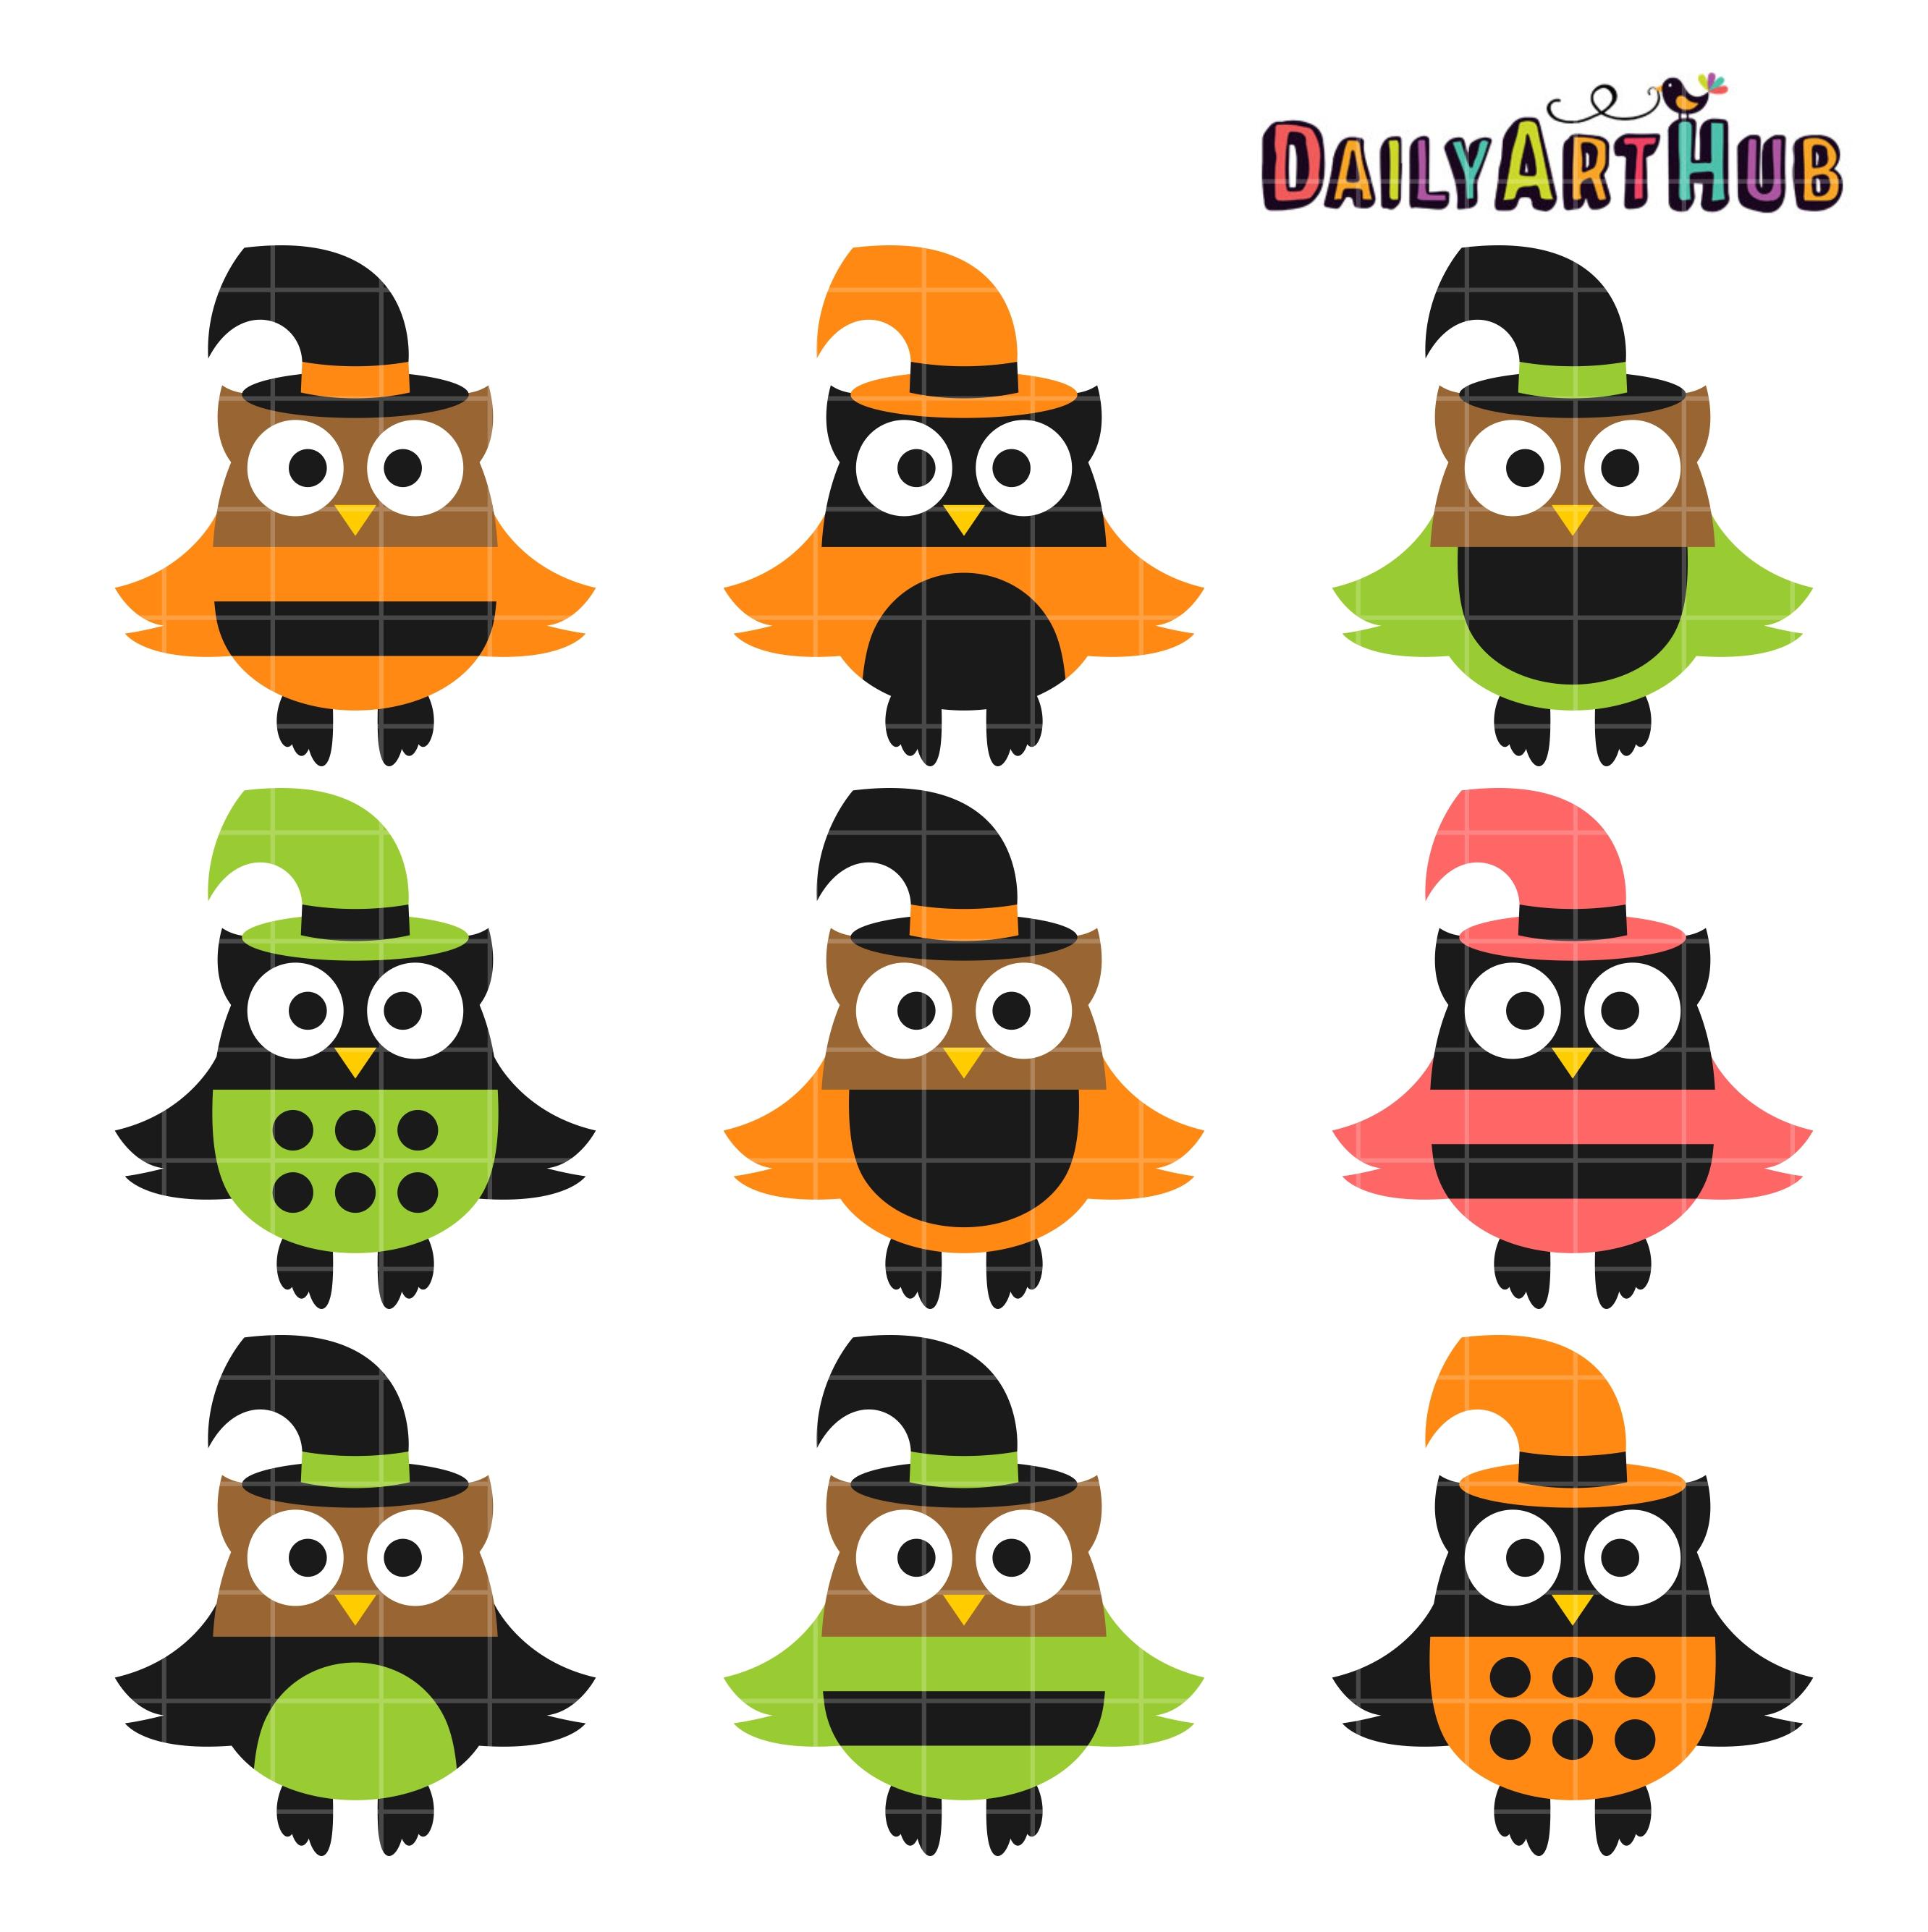 2664x2670 Halloween Owls Clip Art Set Daily Art Hub